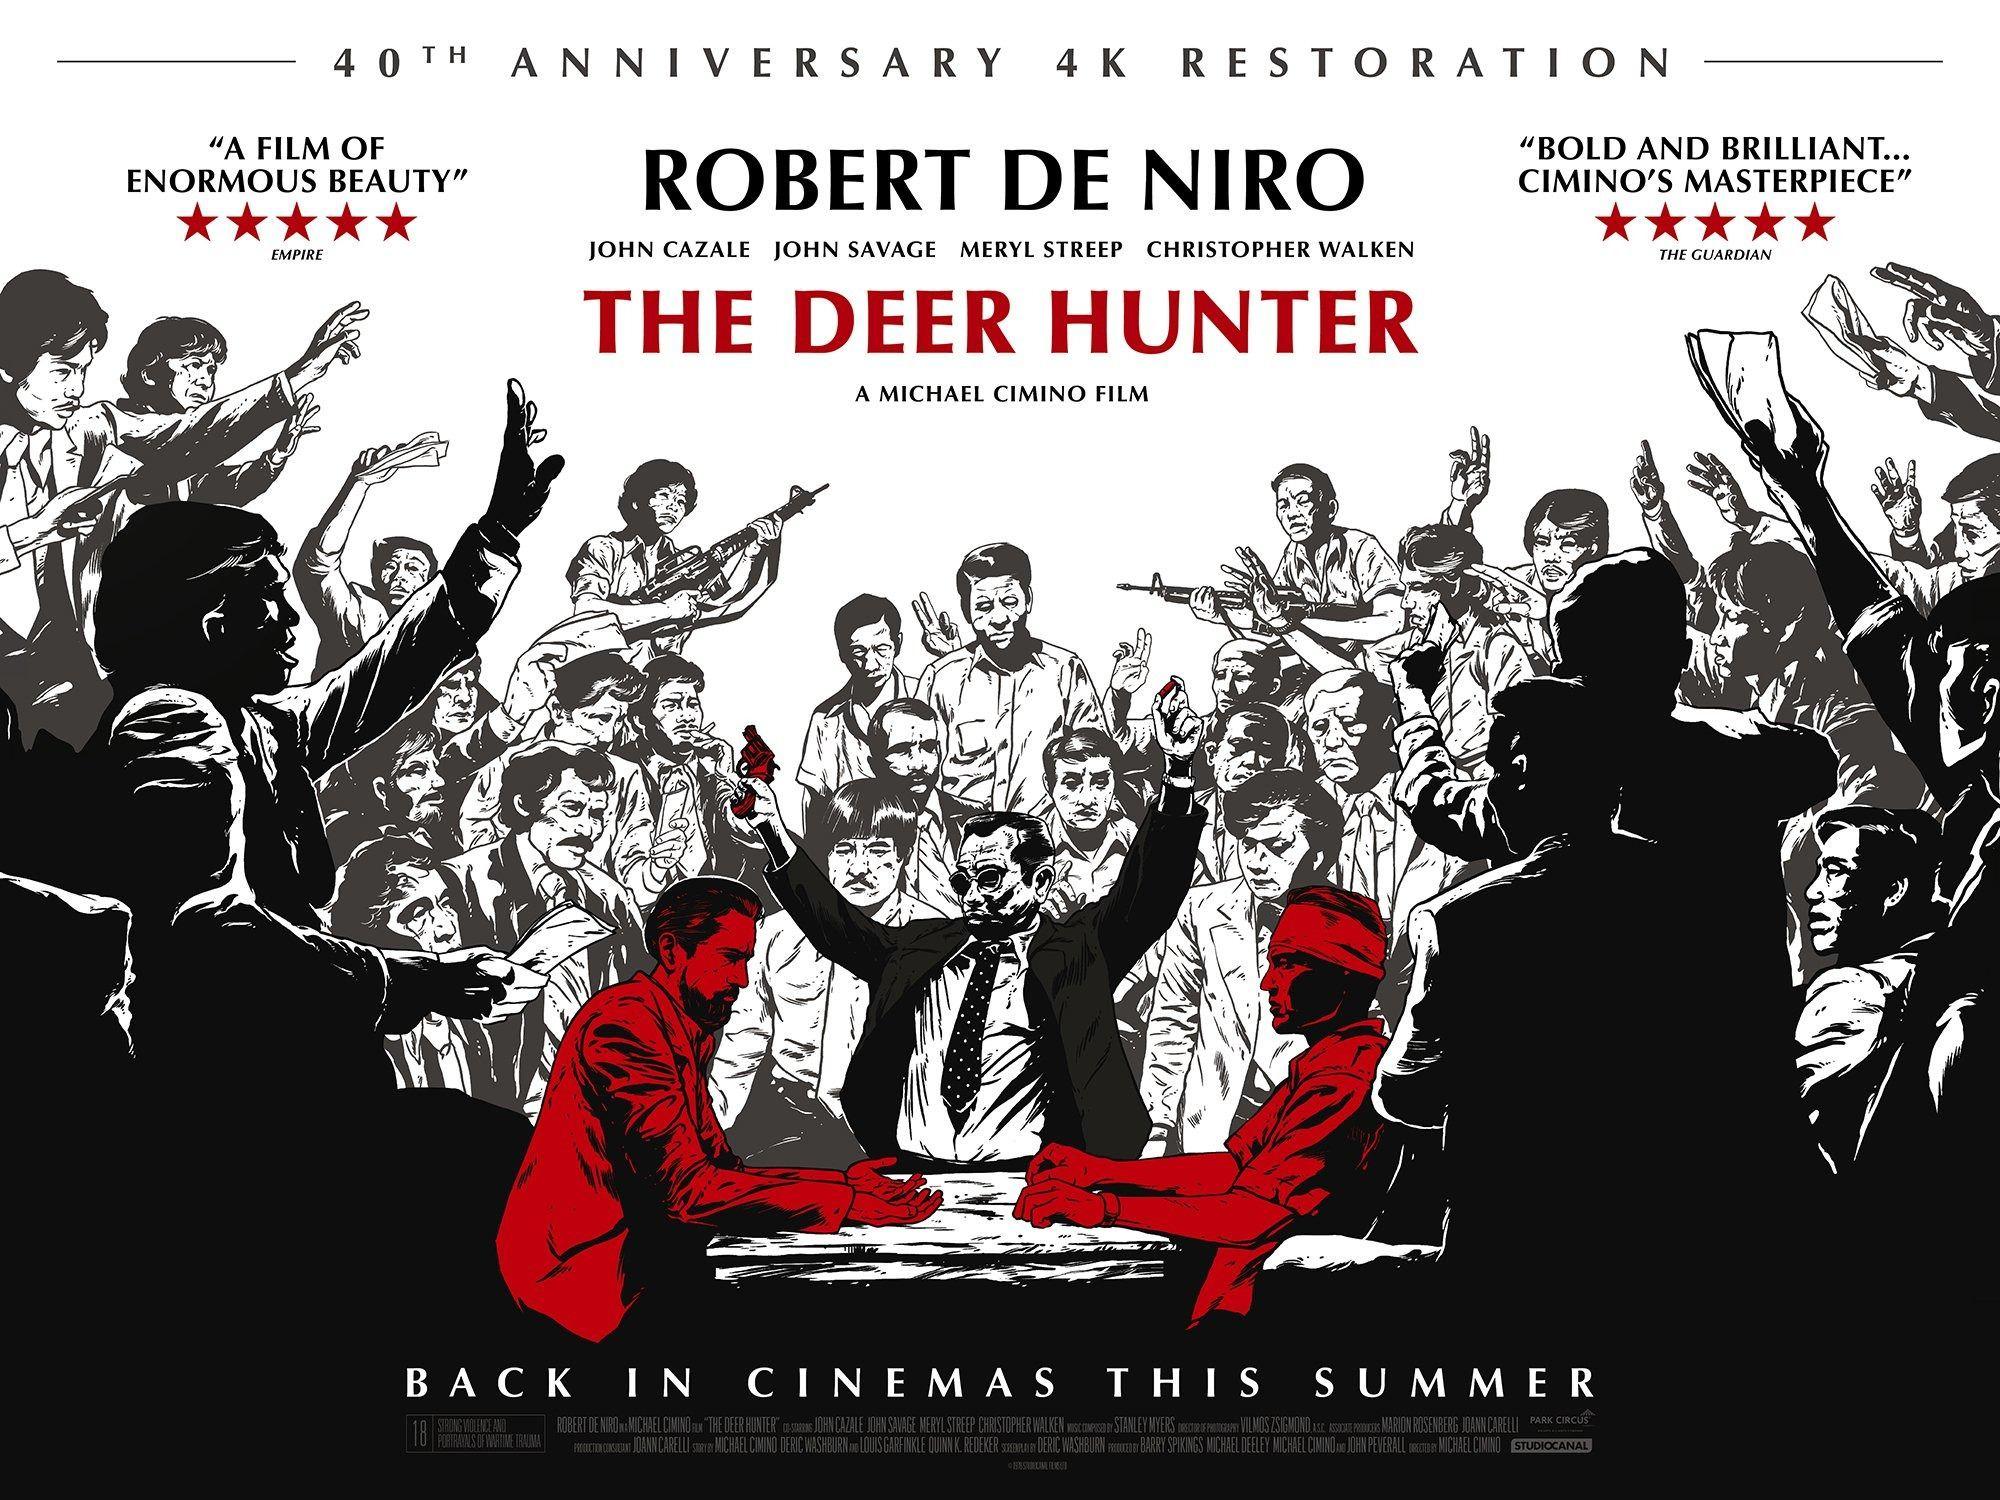 Poster 40th Anniversary Restoration Of Michael Ciminos The Deer Hunter Hunter Movie Movie Posters Deer Hunters